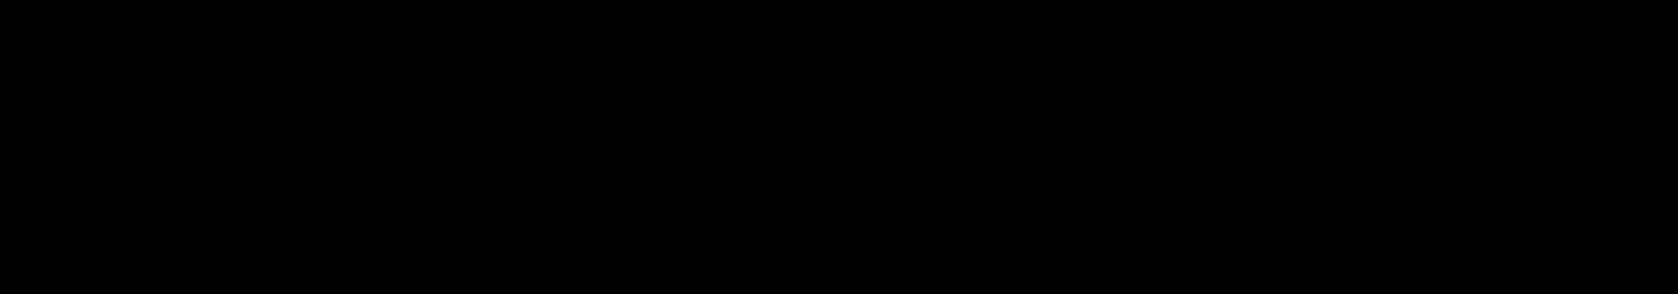 Corpocura